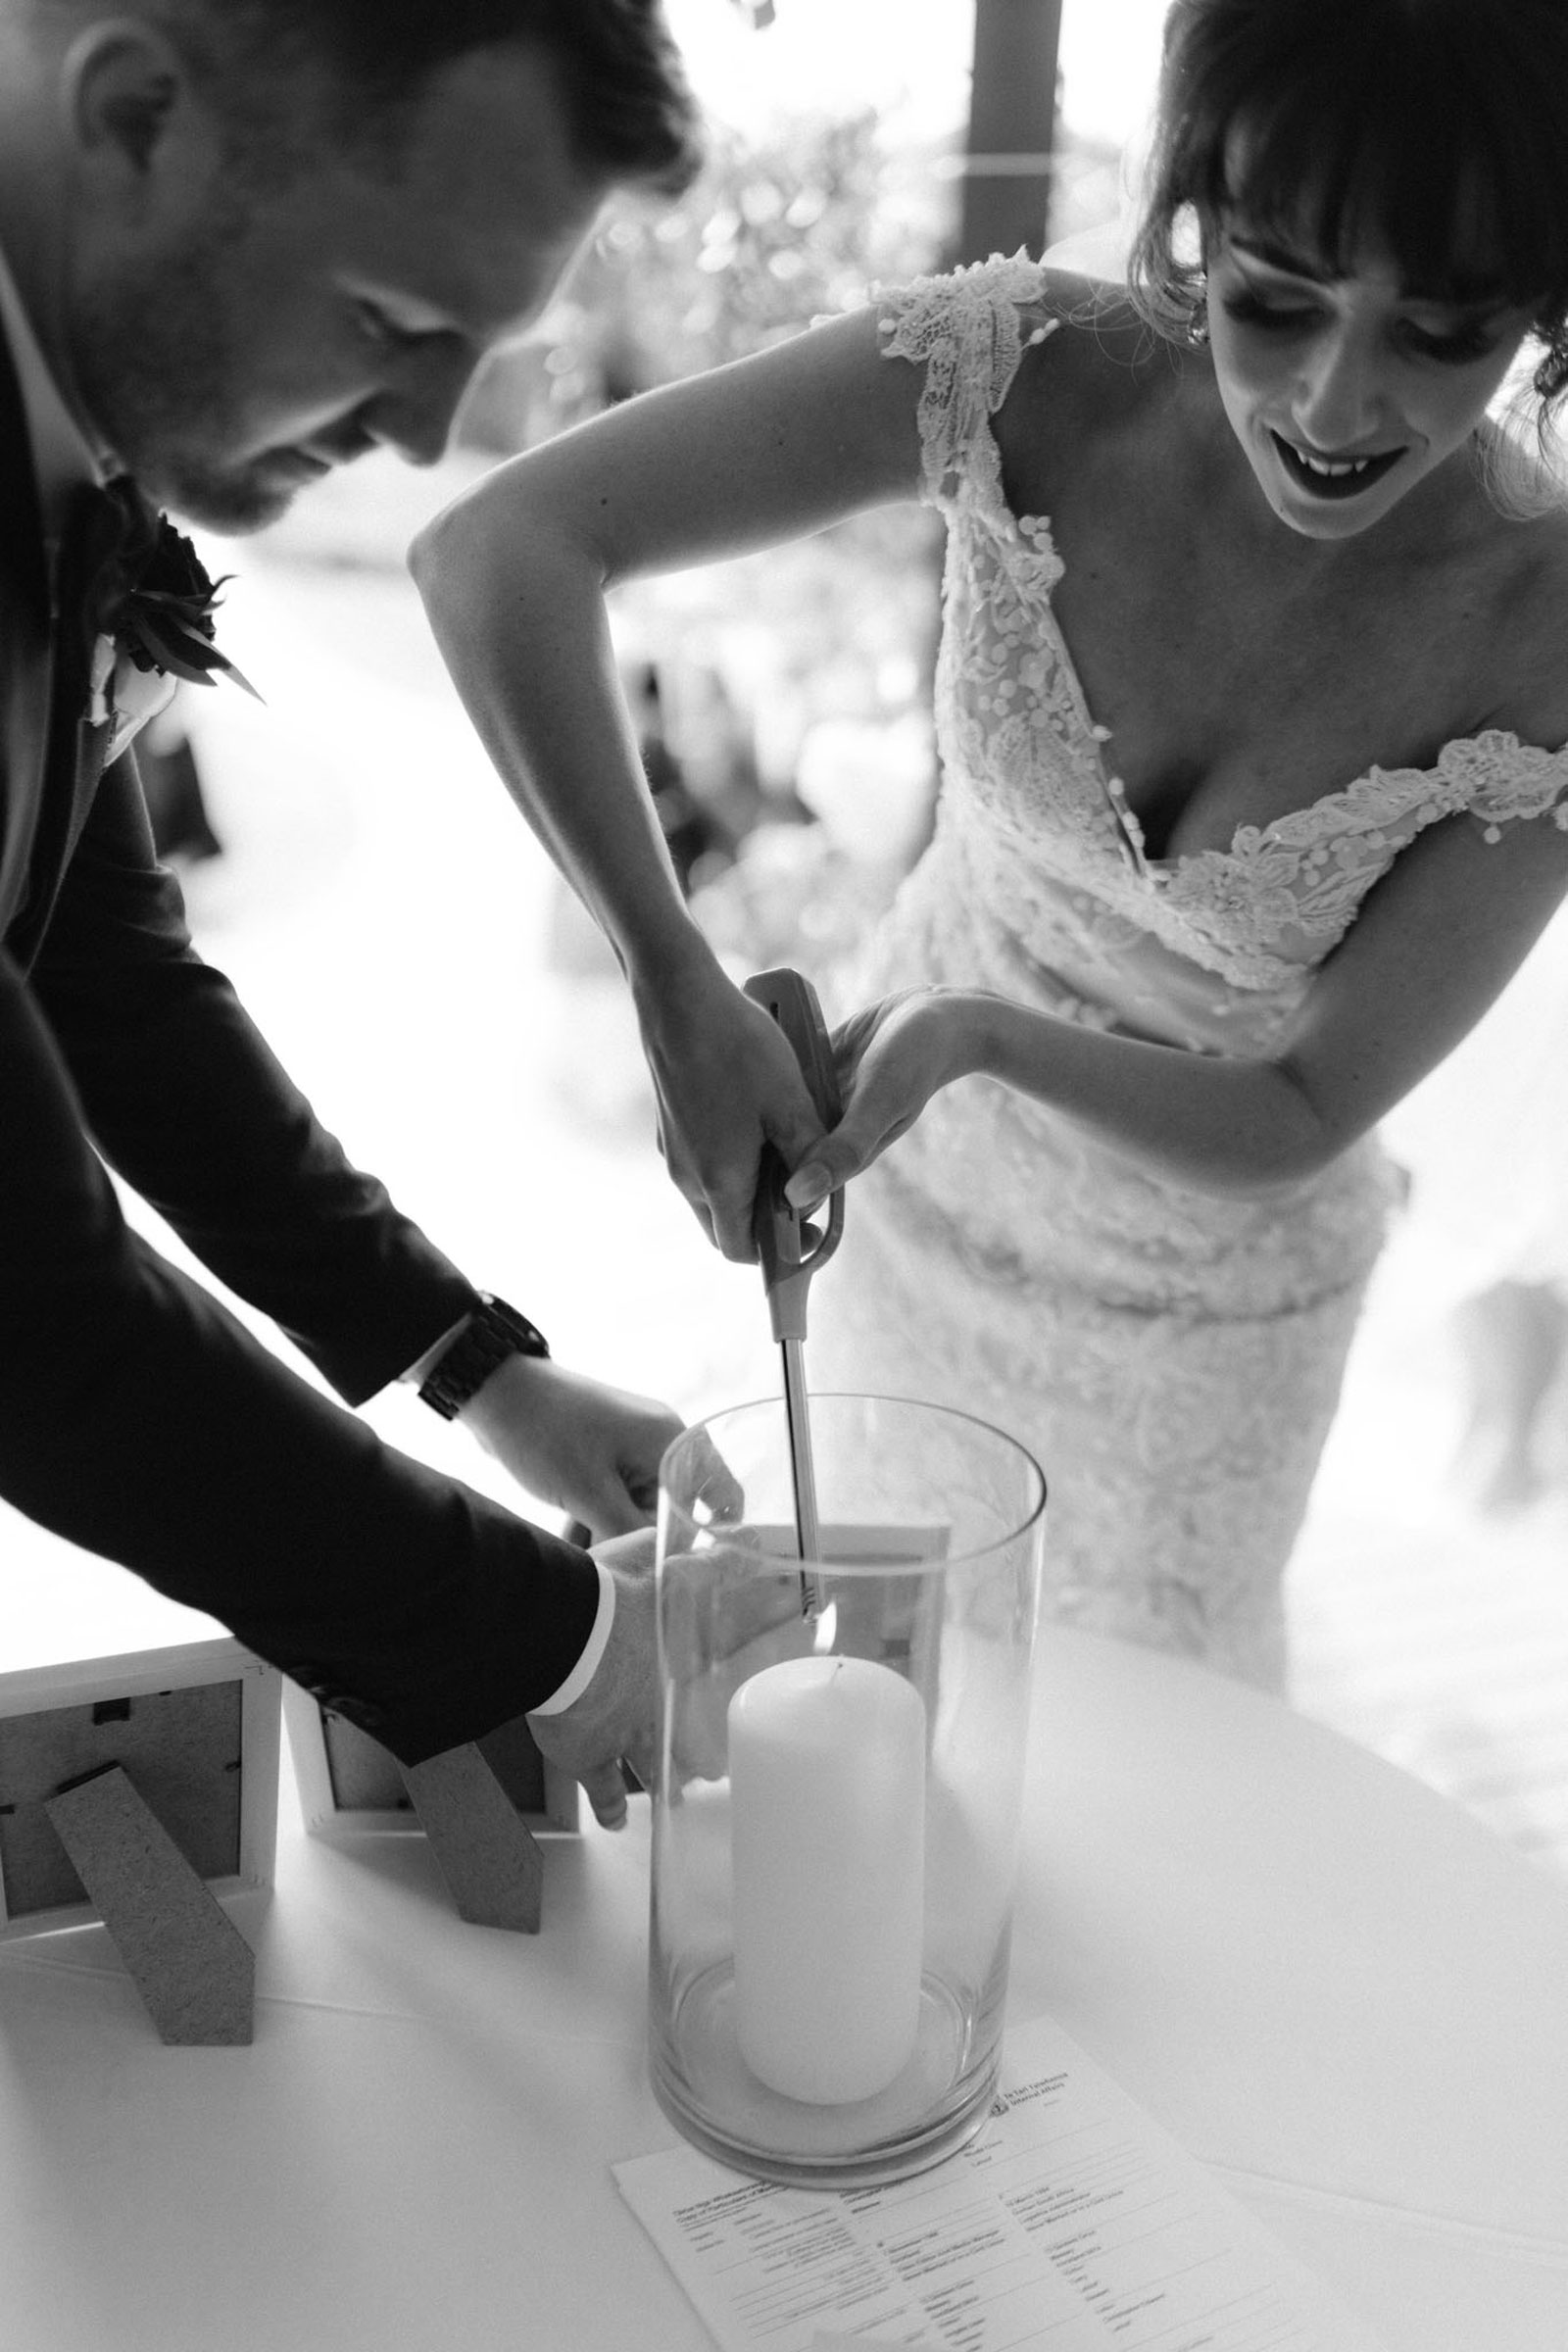 newfound-n-c-olive-tree-cottage-tauranga-wedding-photographer-414A